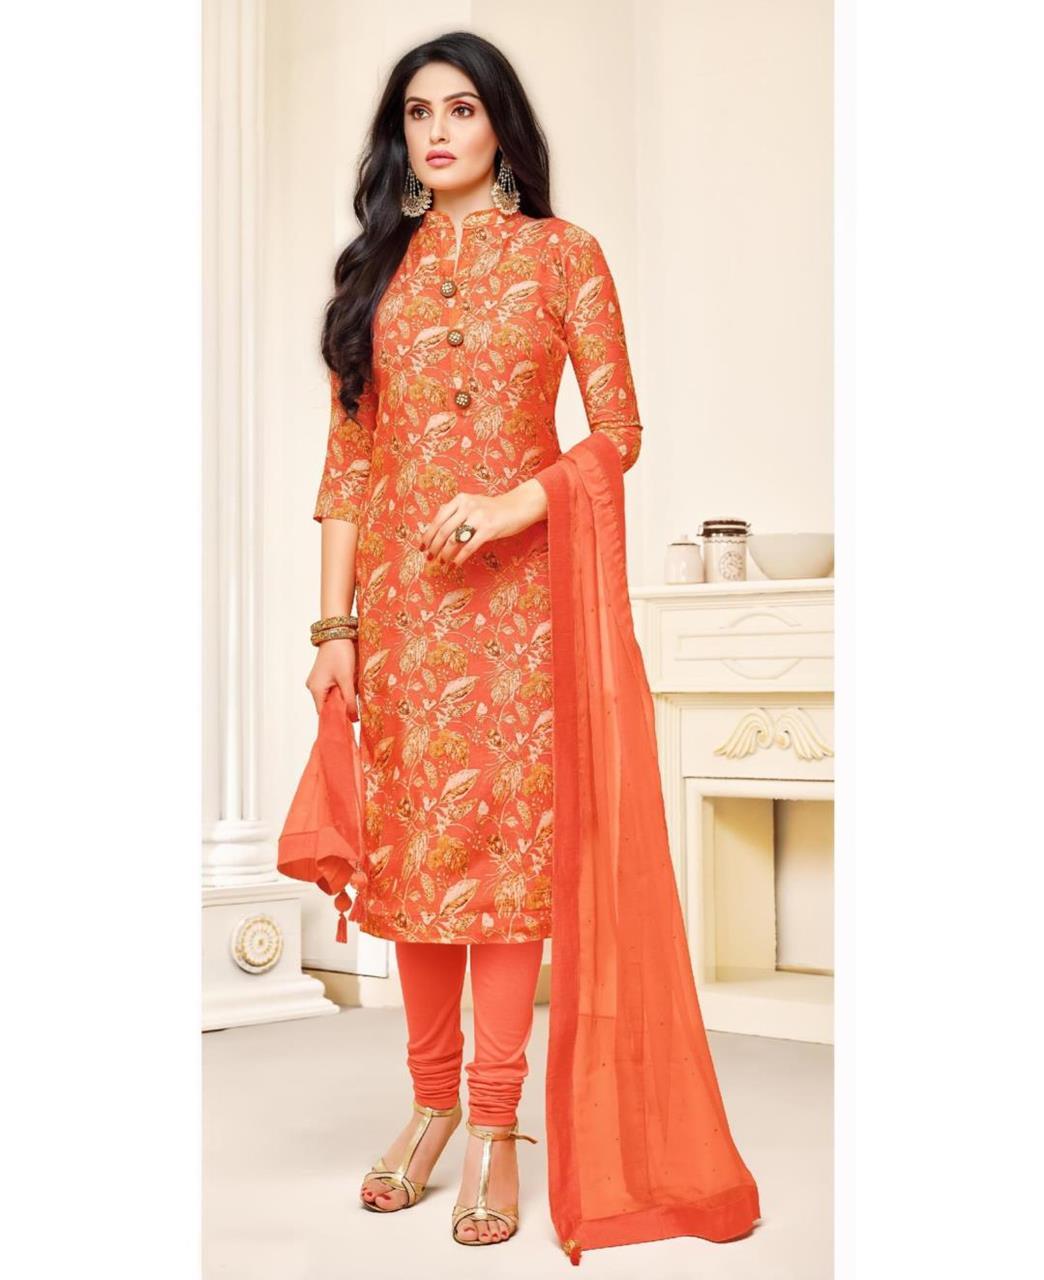 Printed Silk Orange Straight Cut Salwar